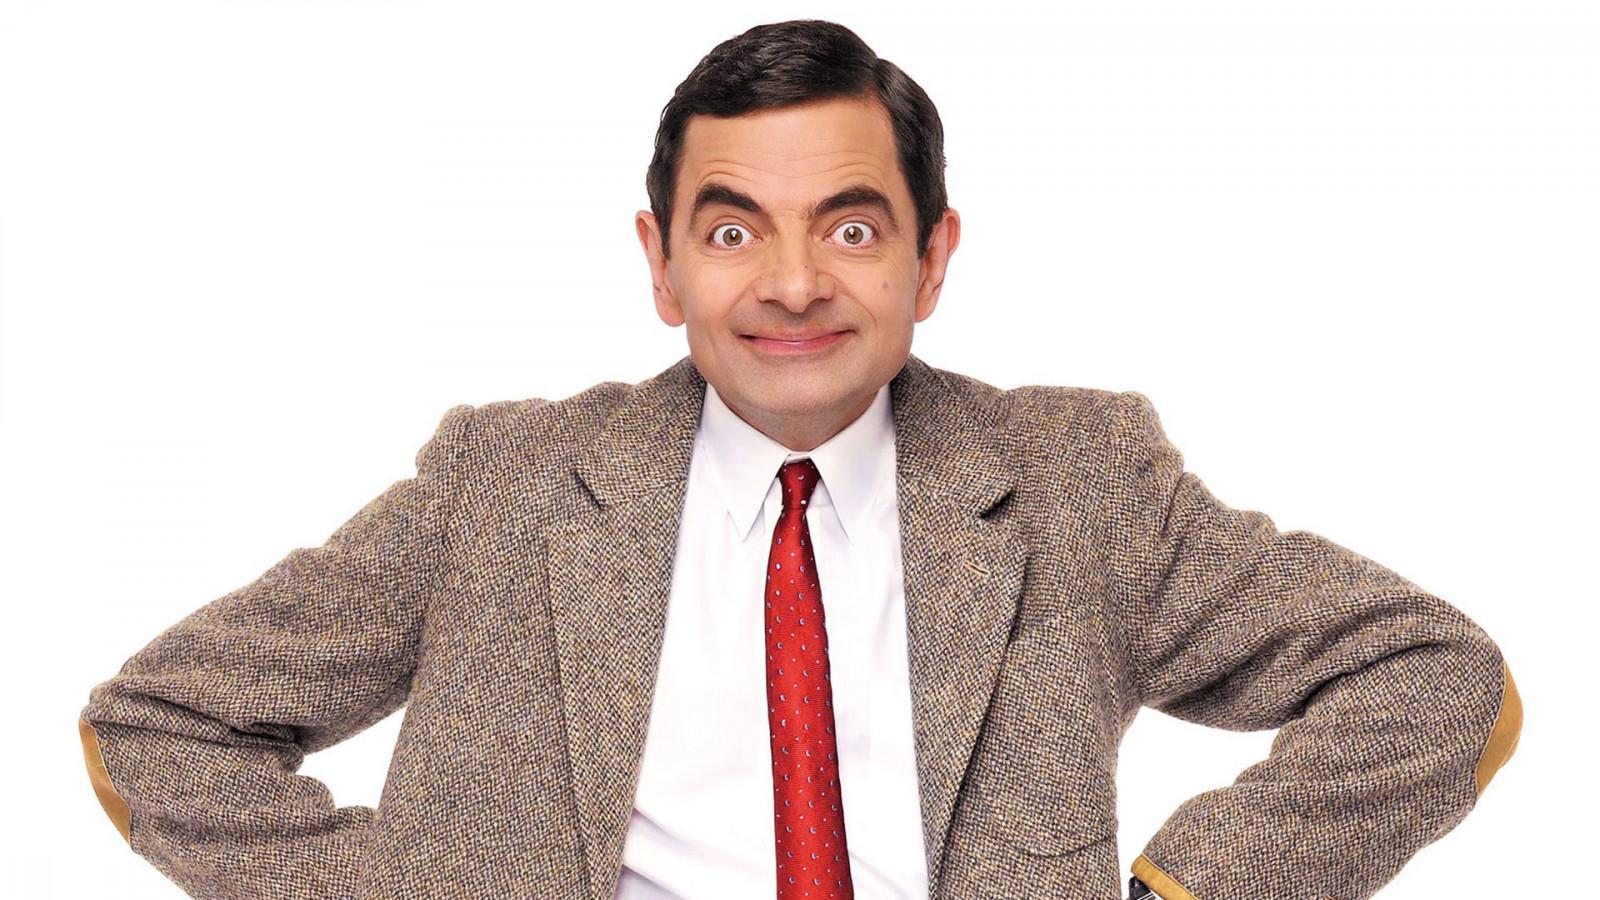 men_actor_Rowan_Atkinson_Mr_Bean_smiling